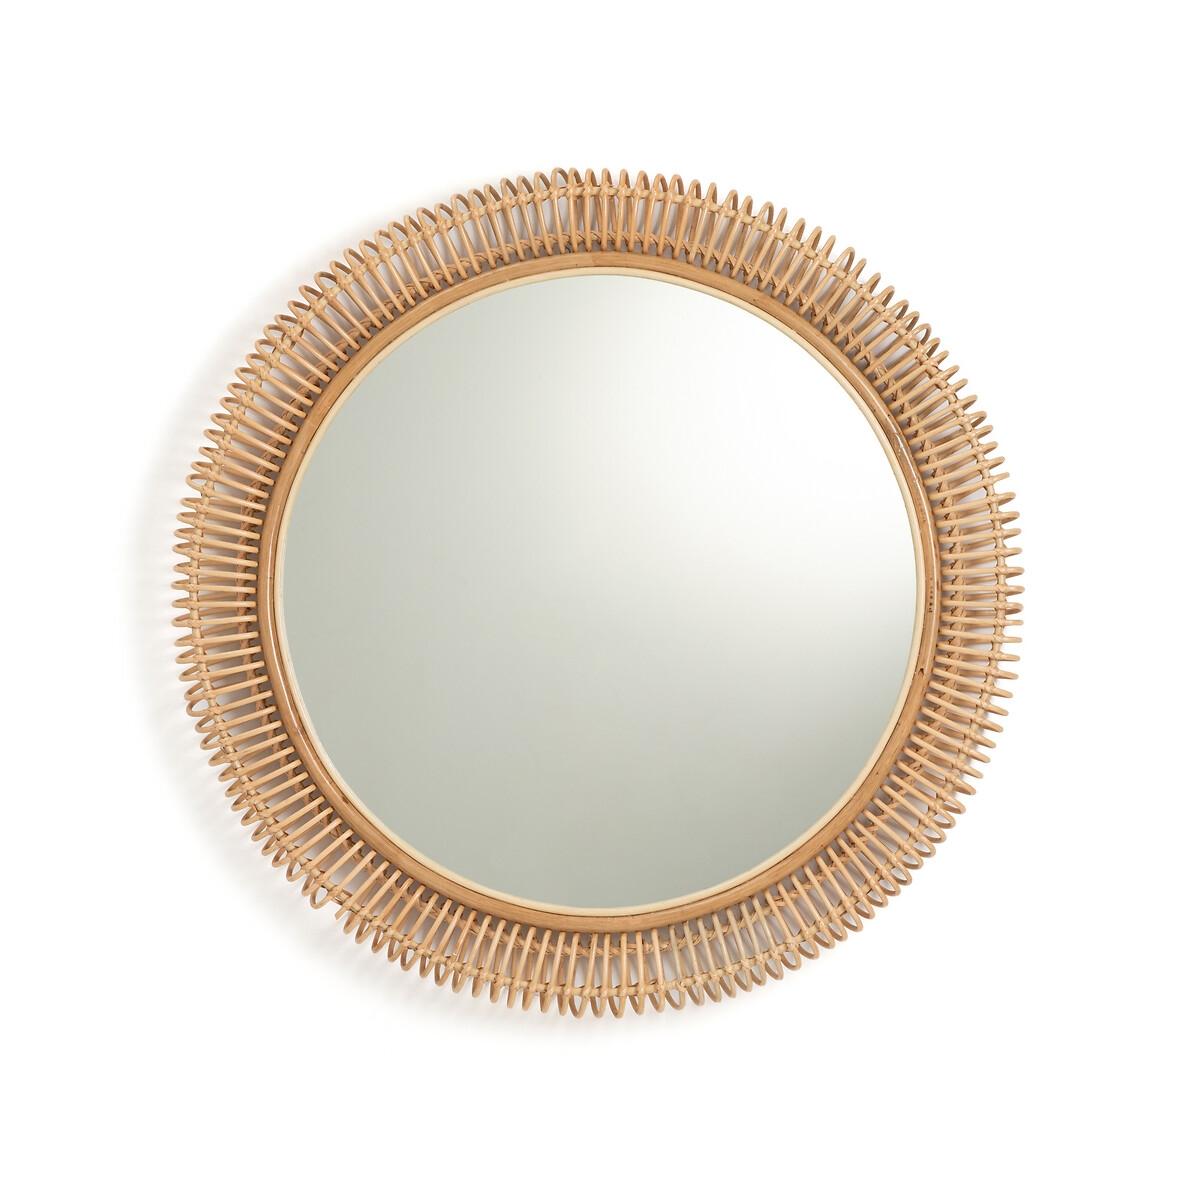 Фото - Зеркало LaRedoute Из ротанга диаметр 100 см Tarsile единый размер бежевый вешалка laredoute из ротанга doka единый размер бежевый